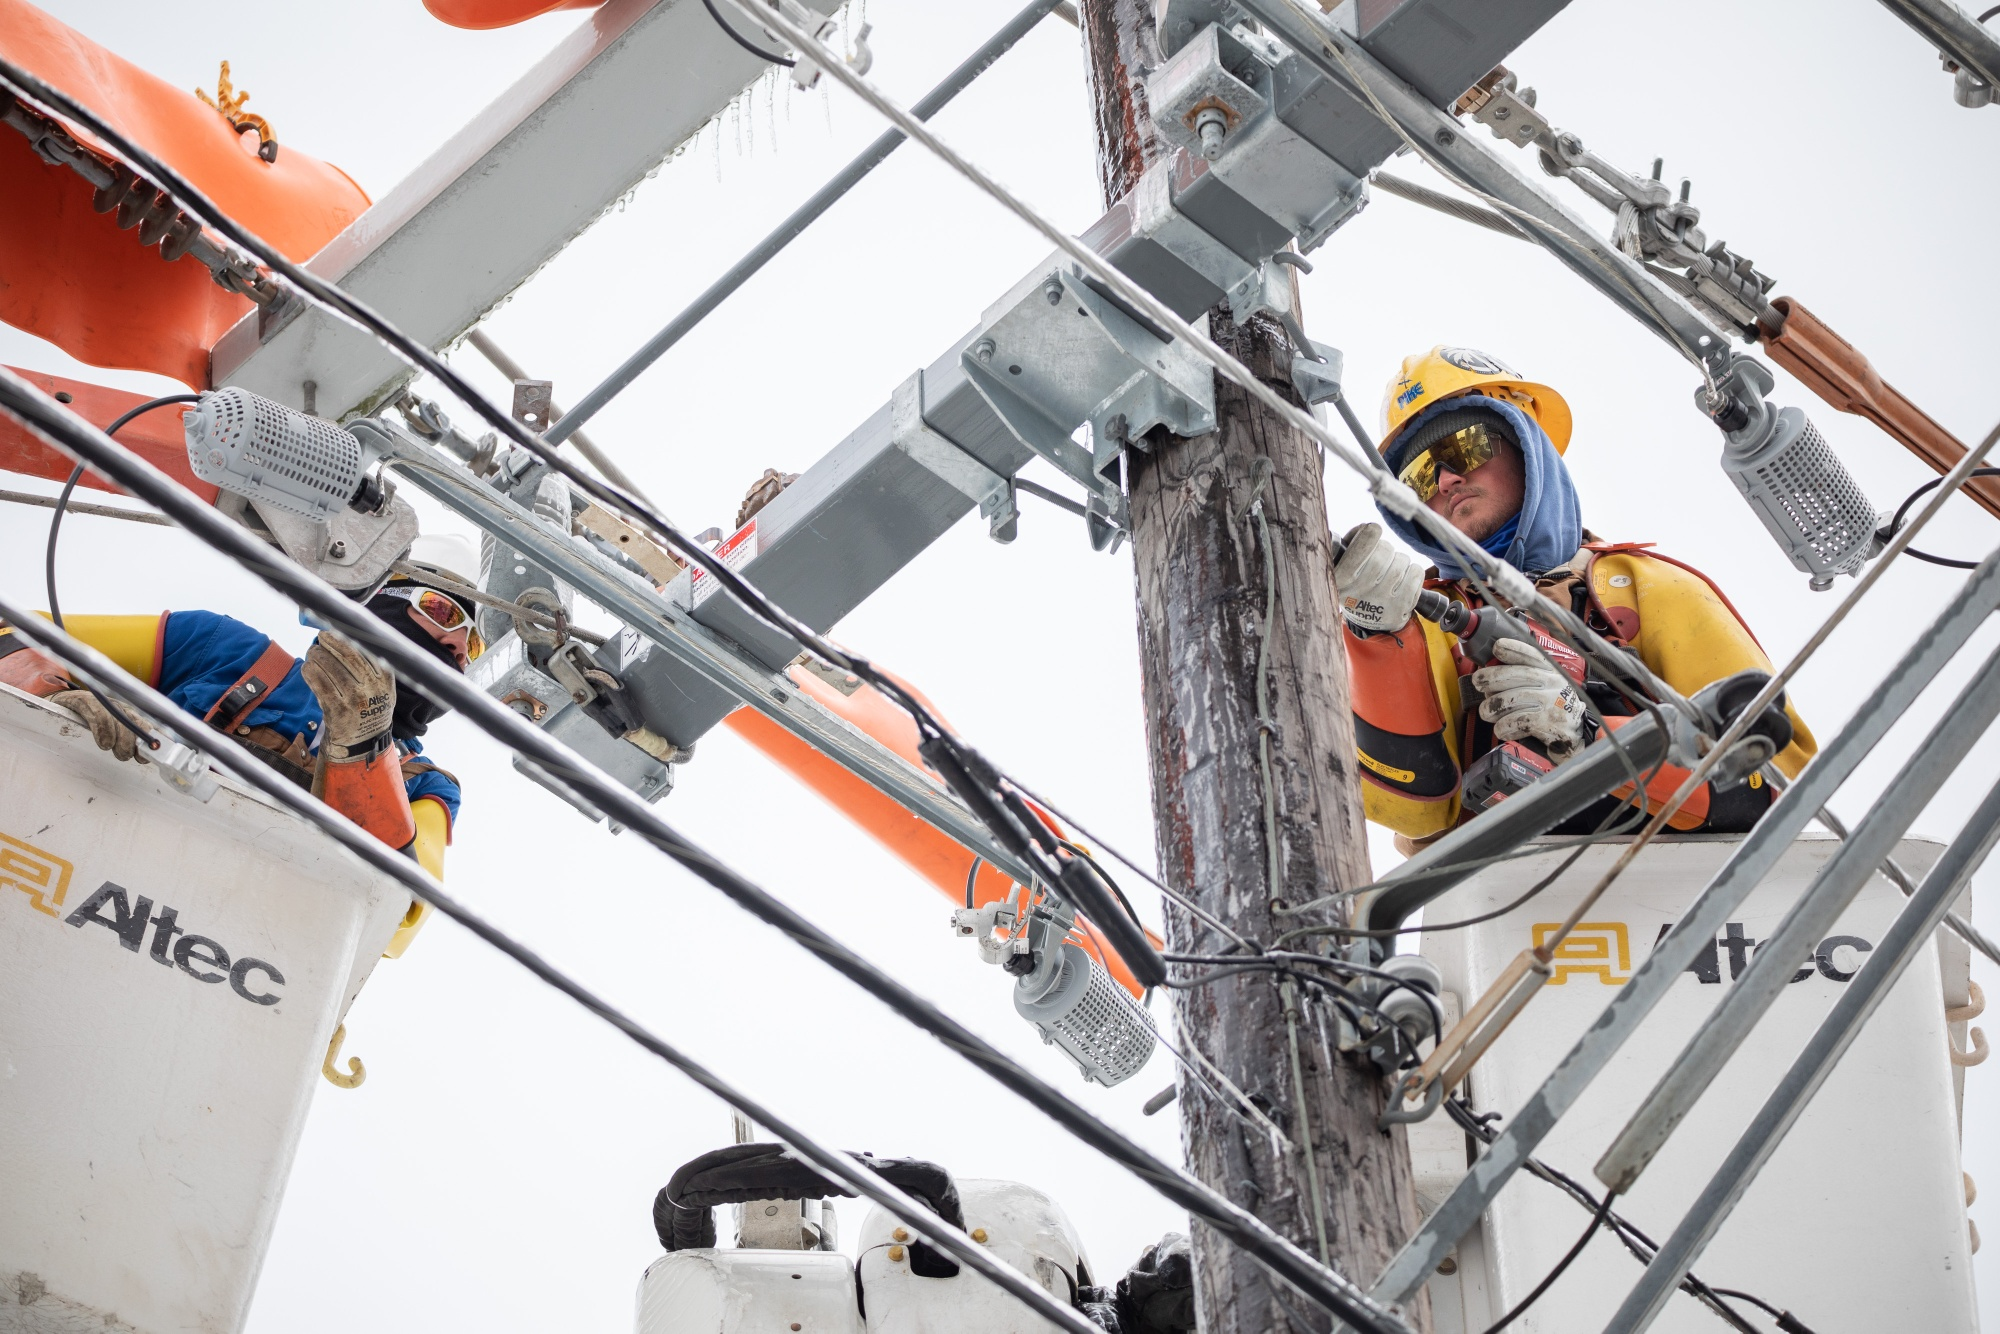 Texas' Gas-Export Clampdown Shocks Market As Blackouts Drag On